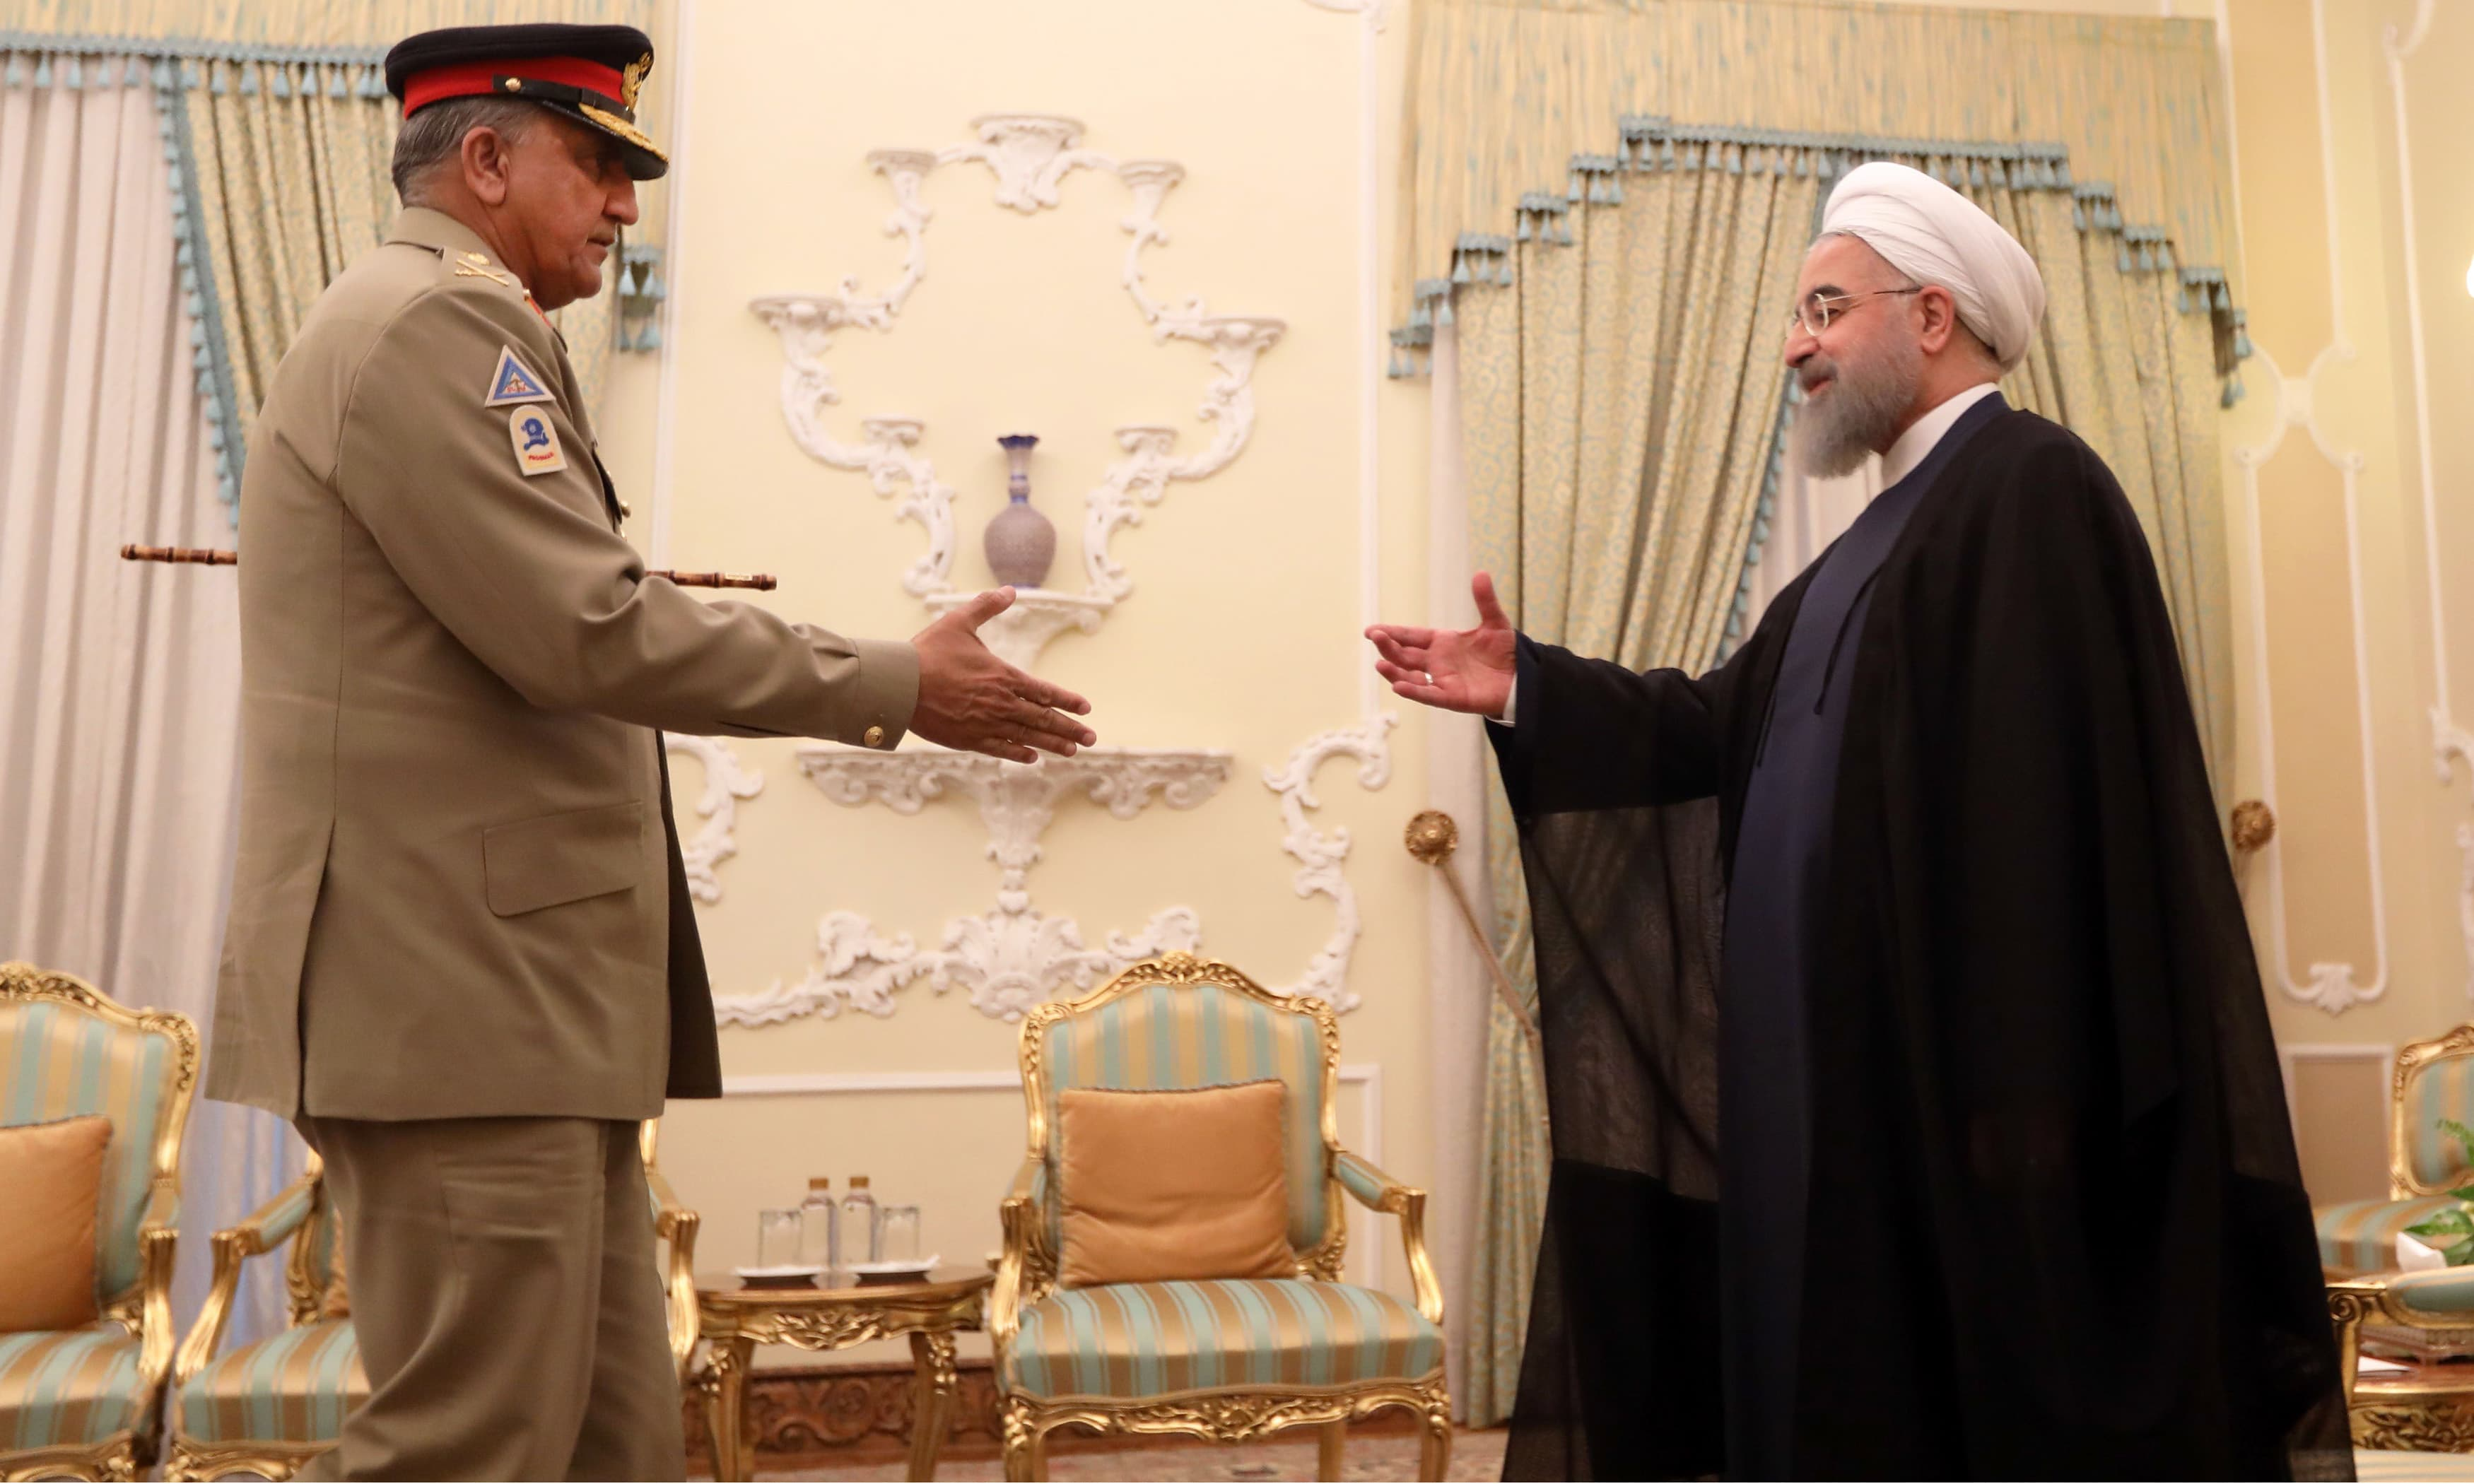 Iranian President Hassan Rouhani meets Army Chief General Qamar Javed Bajwa in Tehran. —AFP